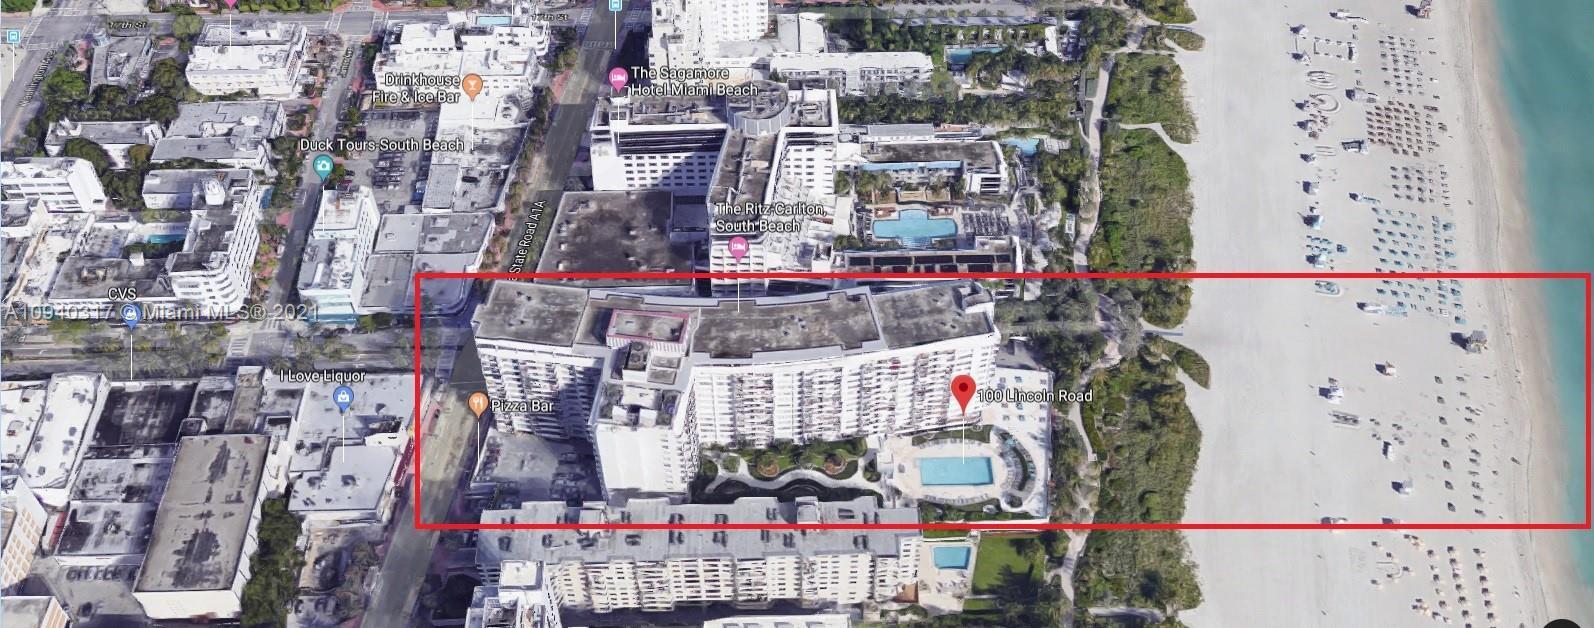 Decoplage #1648 - 100 Lincoln Rd #1648, Miami Beach, FL 33139